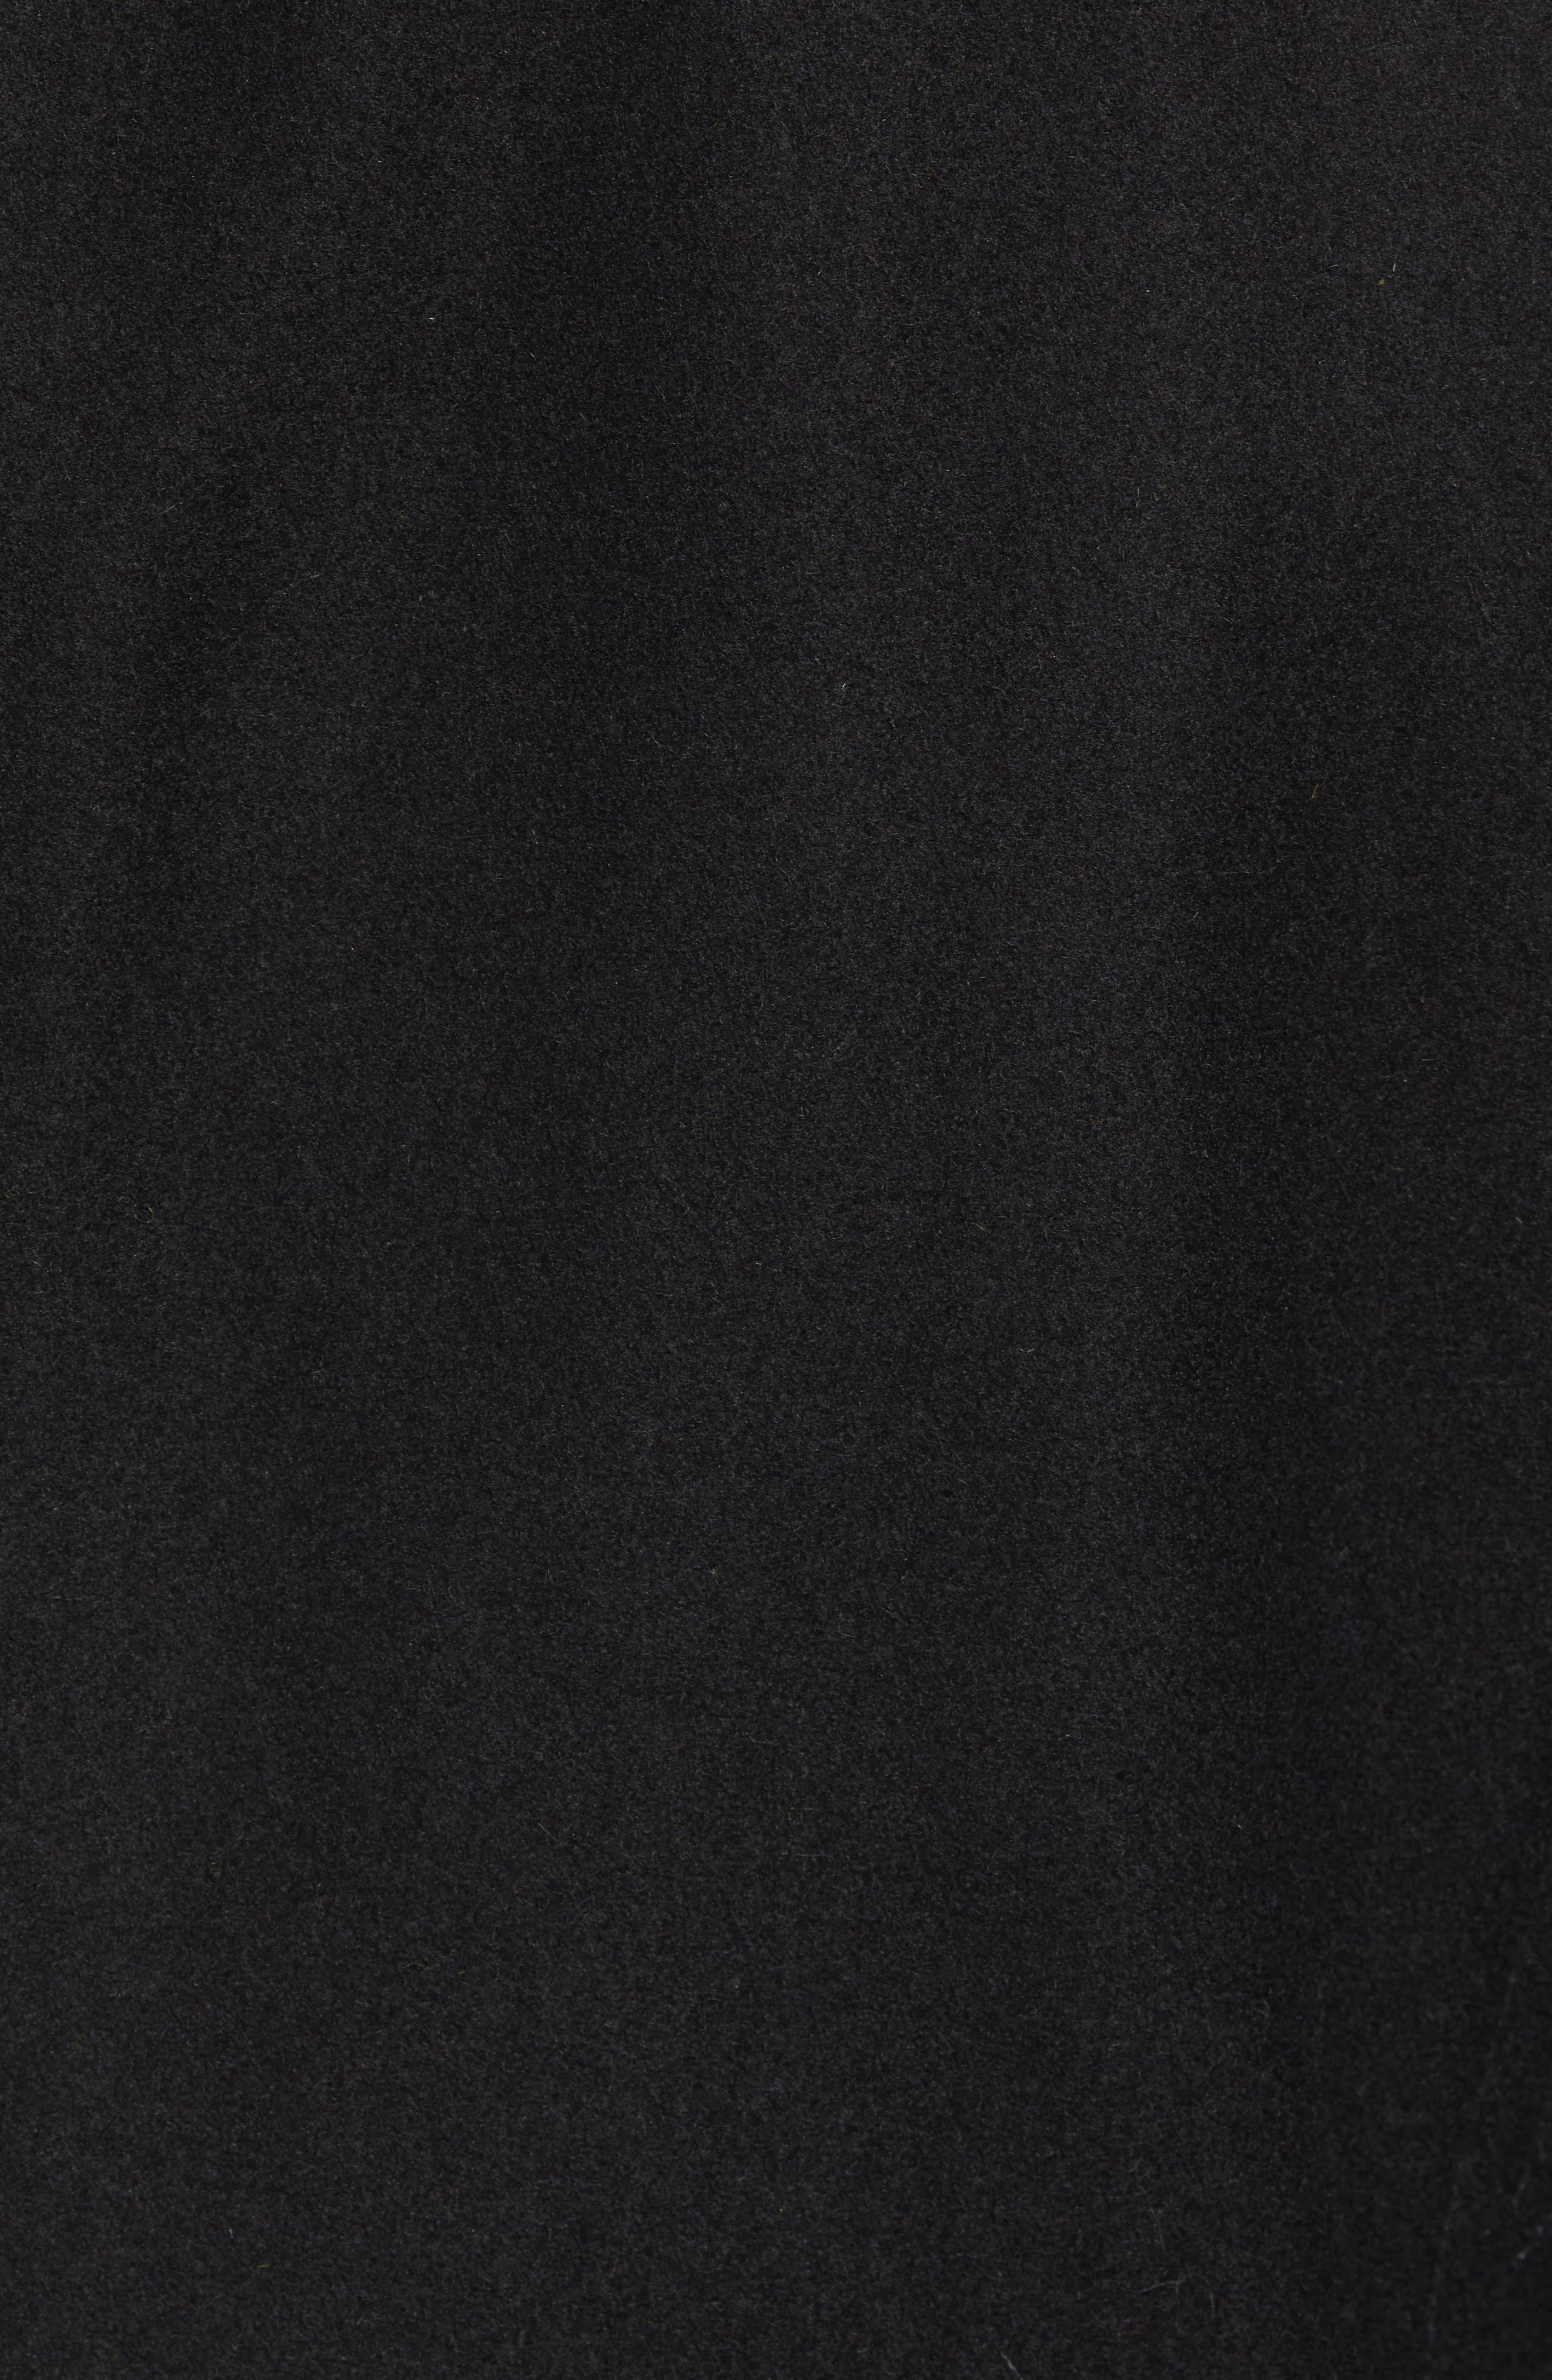 MARC NEW YORK, Barlow Wool Blend Bomber Jacket, Alternate thumbnail 7, color, 001